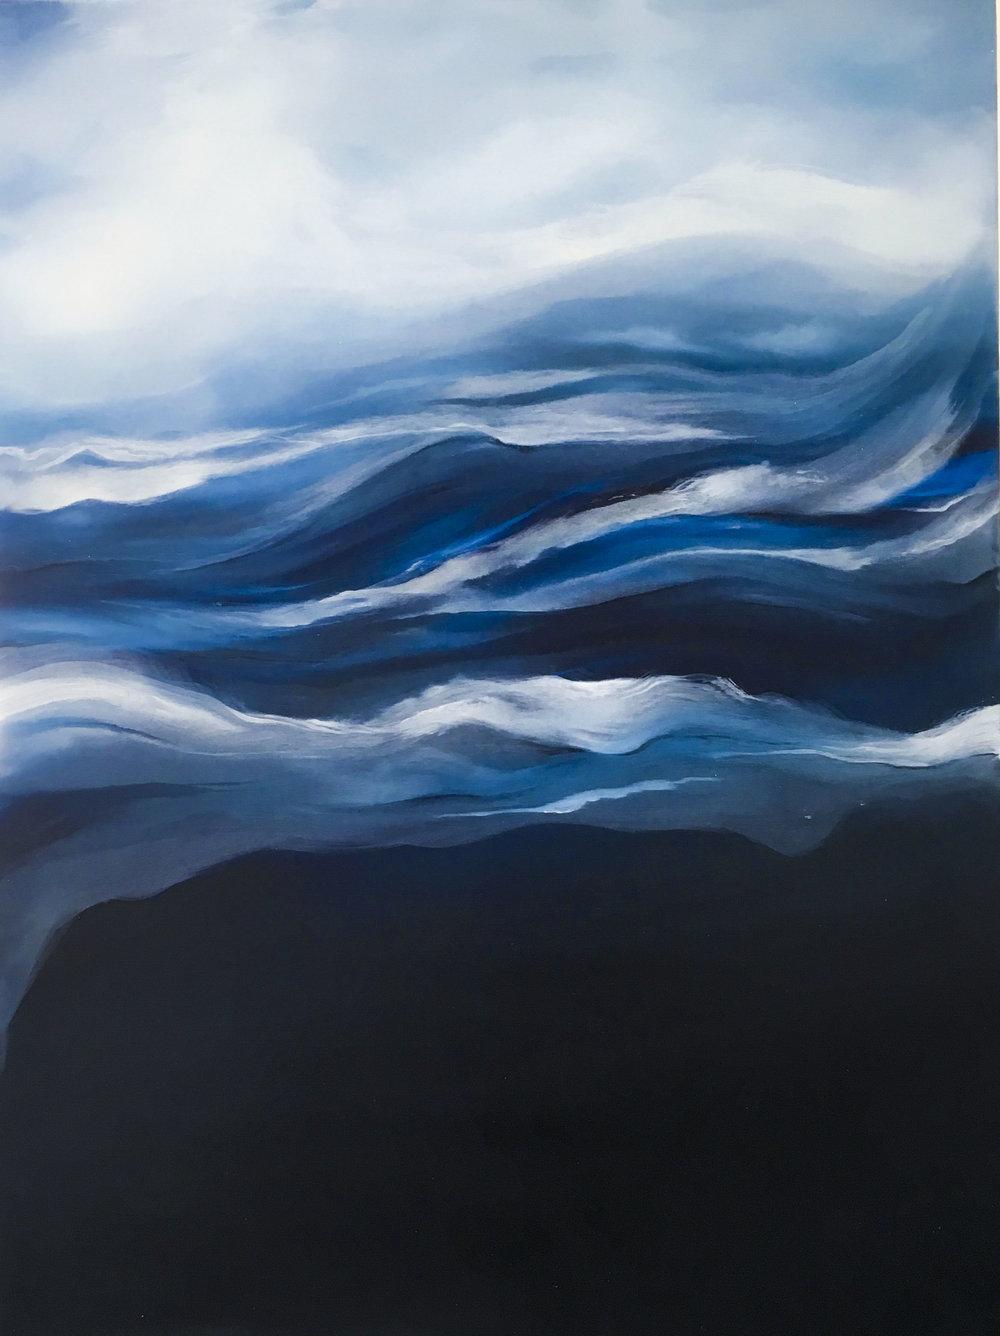 Undulation+II_+2015_+101x76cm_+Oil+on+Canvas.jpg